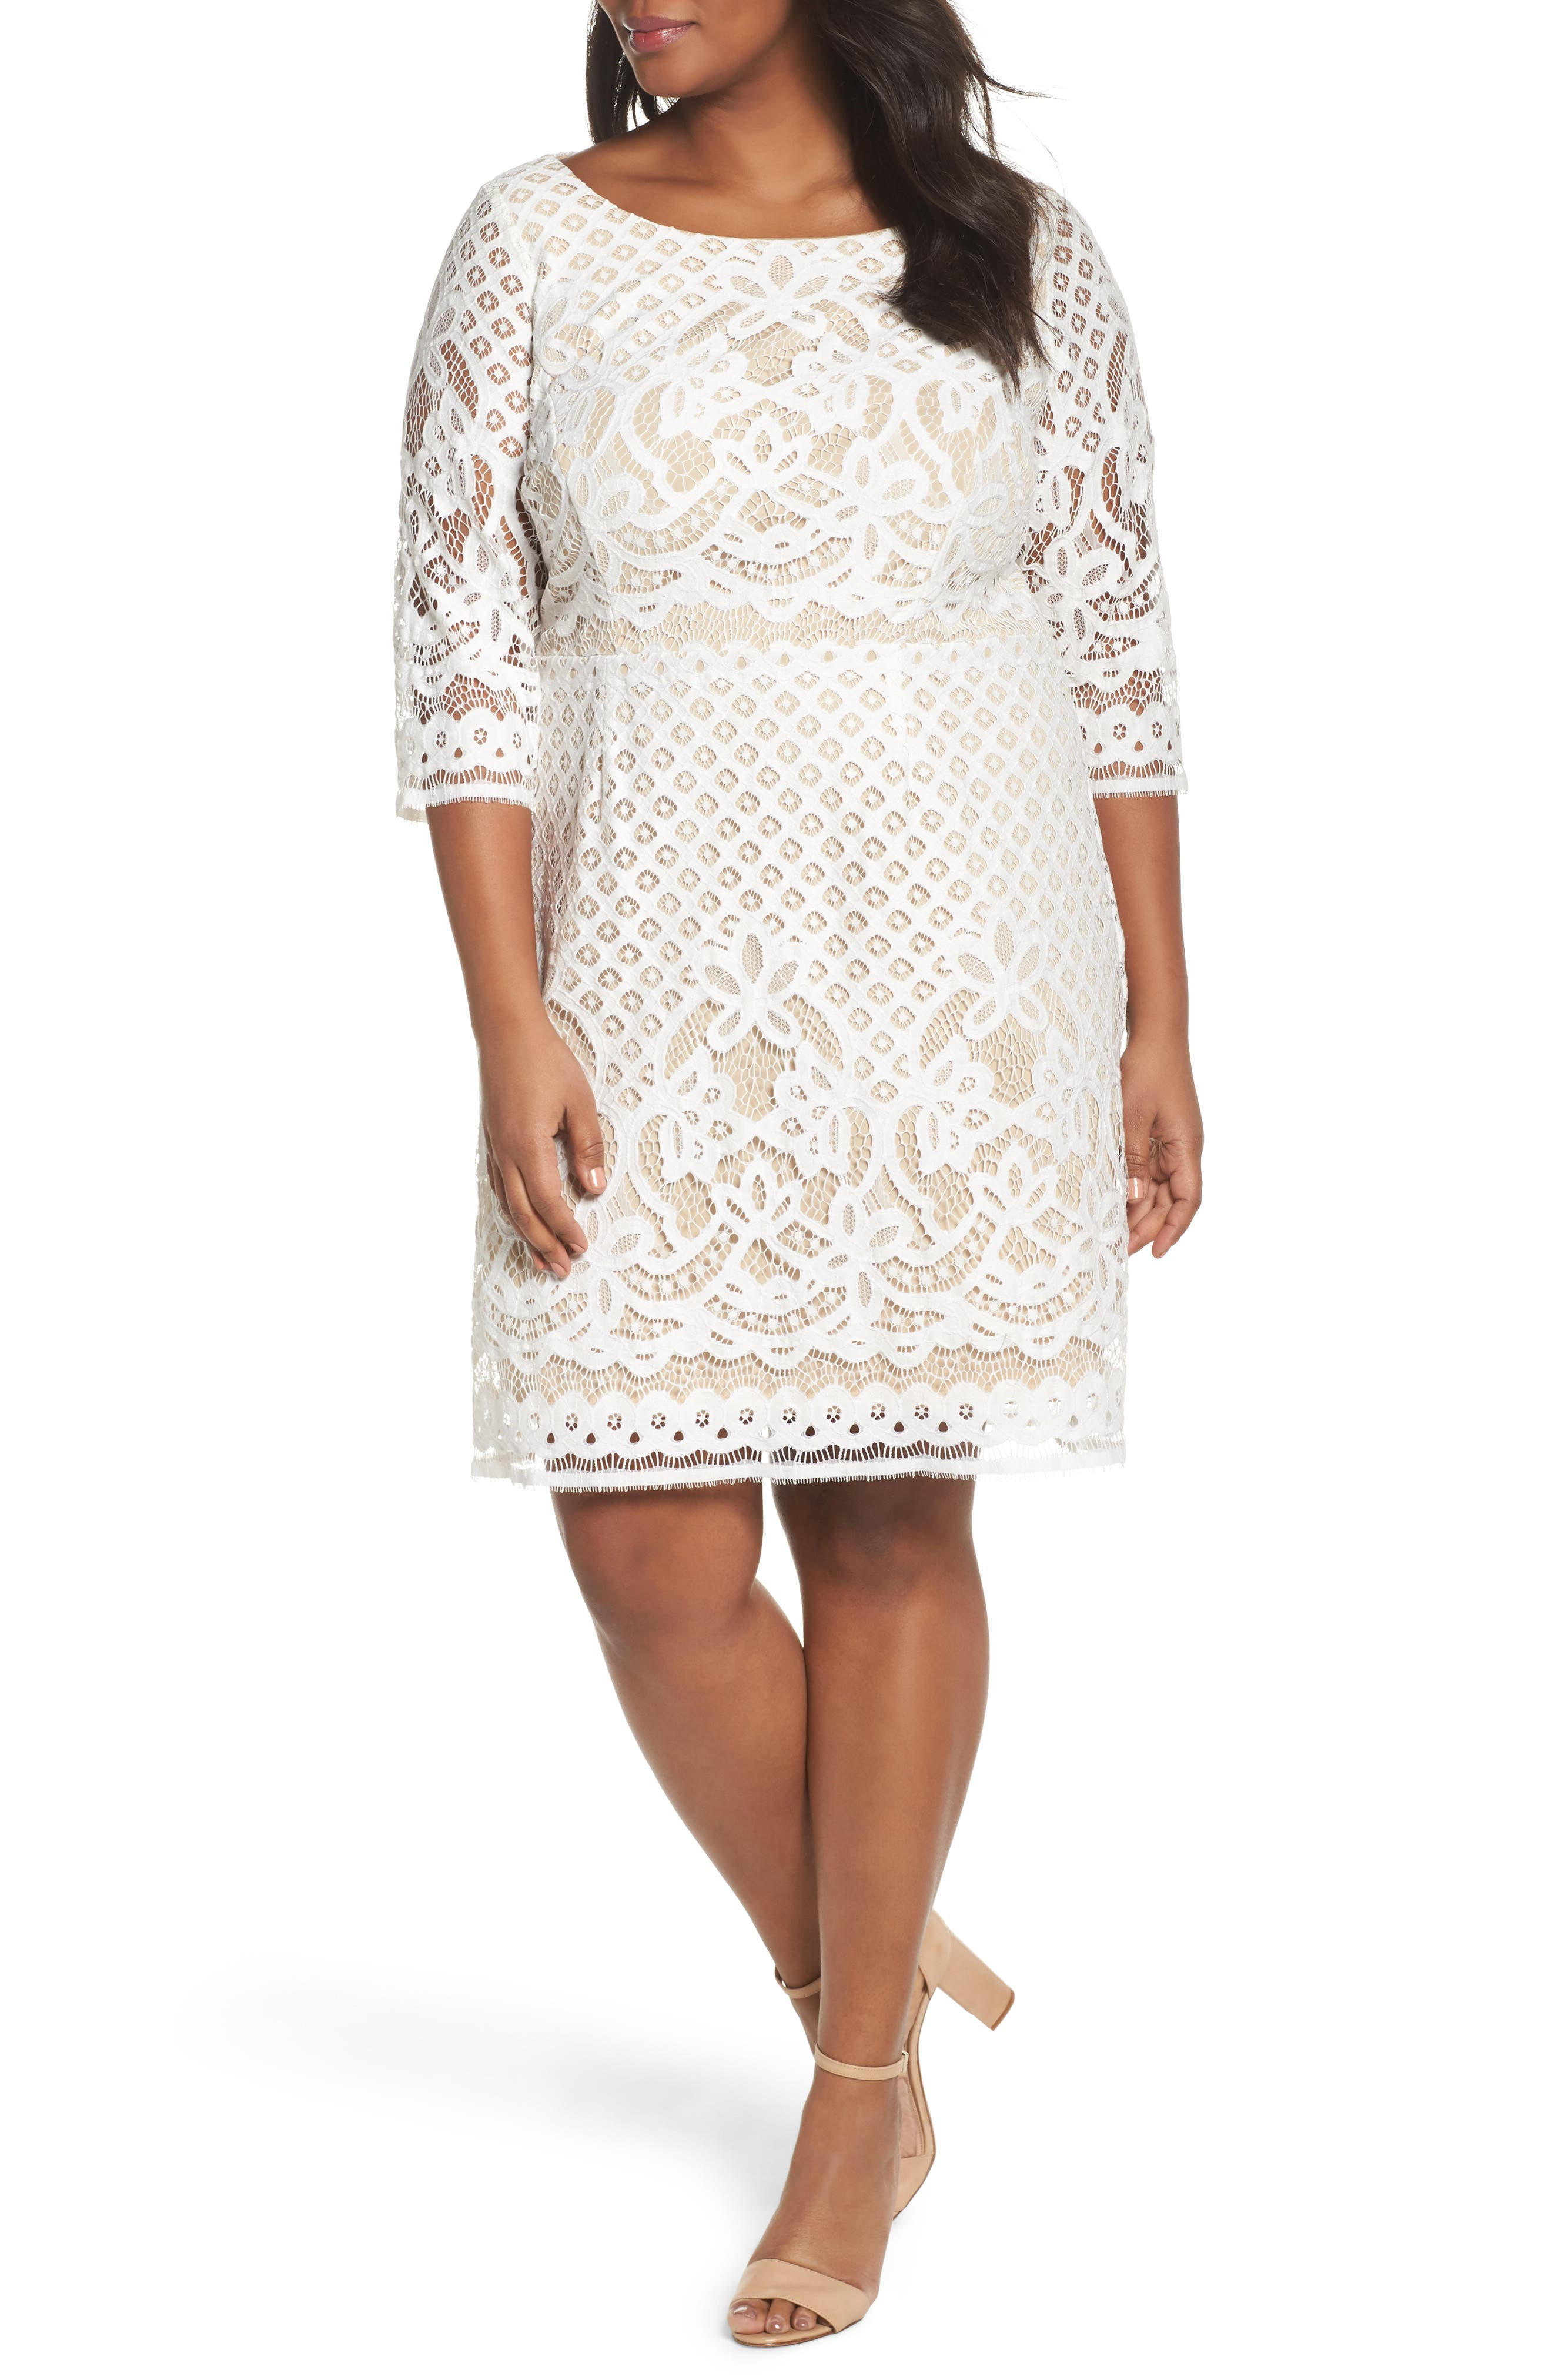 White plus size dress for women